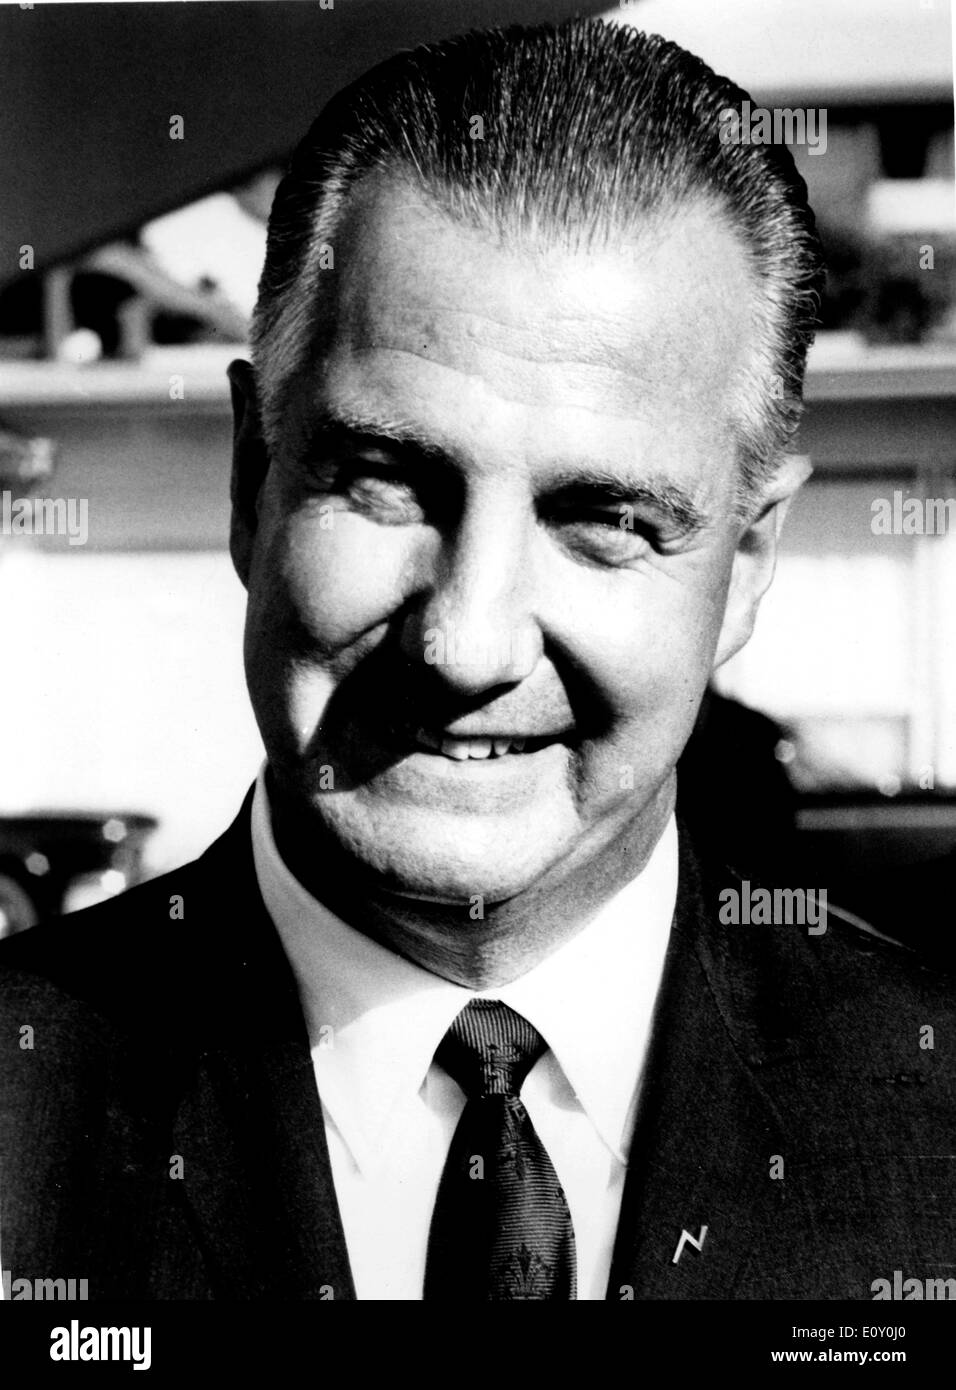 Feb 15, 1968; Washington, VA, USA; THEODORE SPIRO AGNEW, Vice President of the United States was born in Baltimore, November 9, - Stock Image